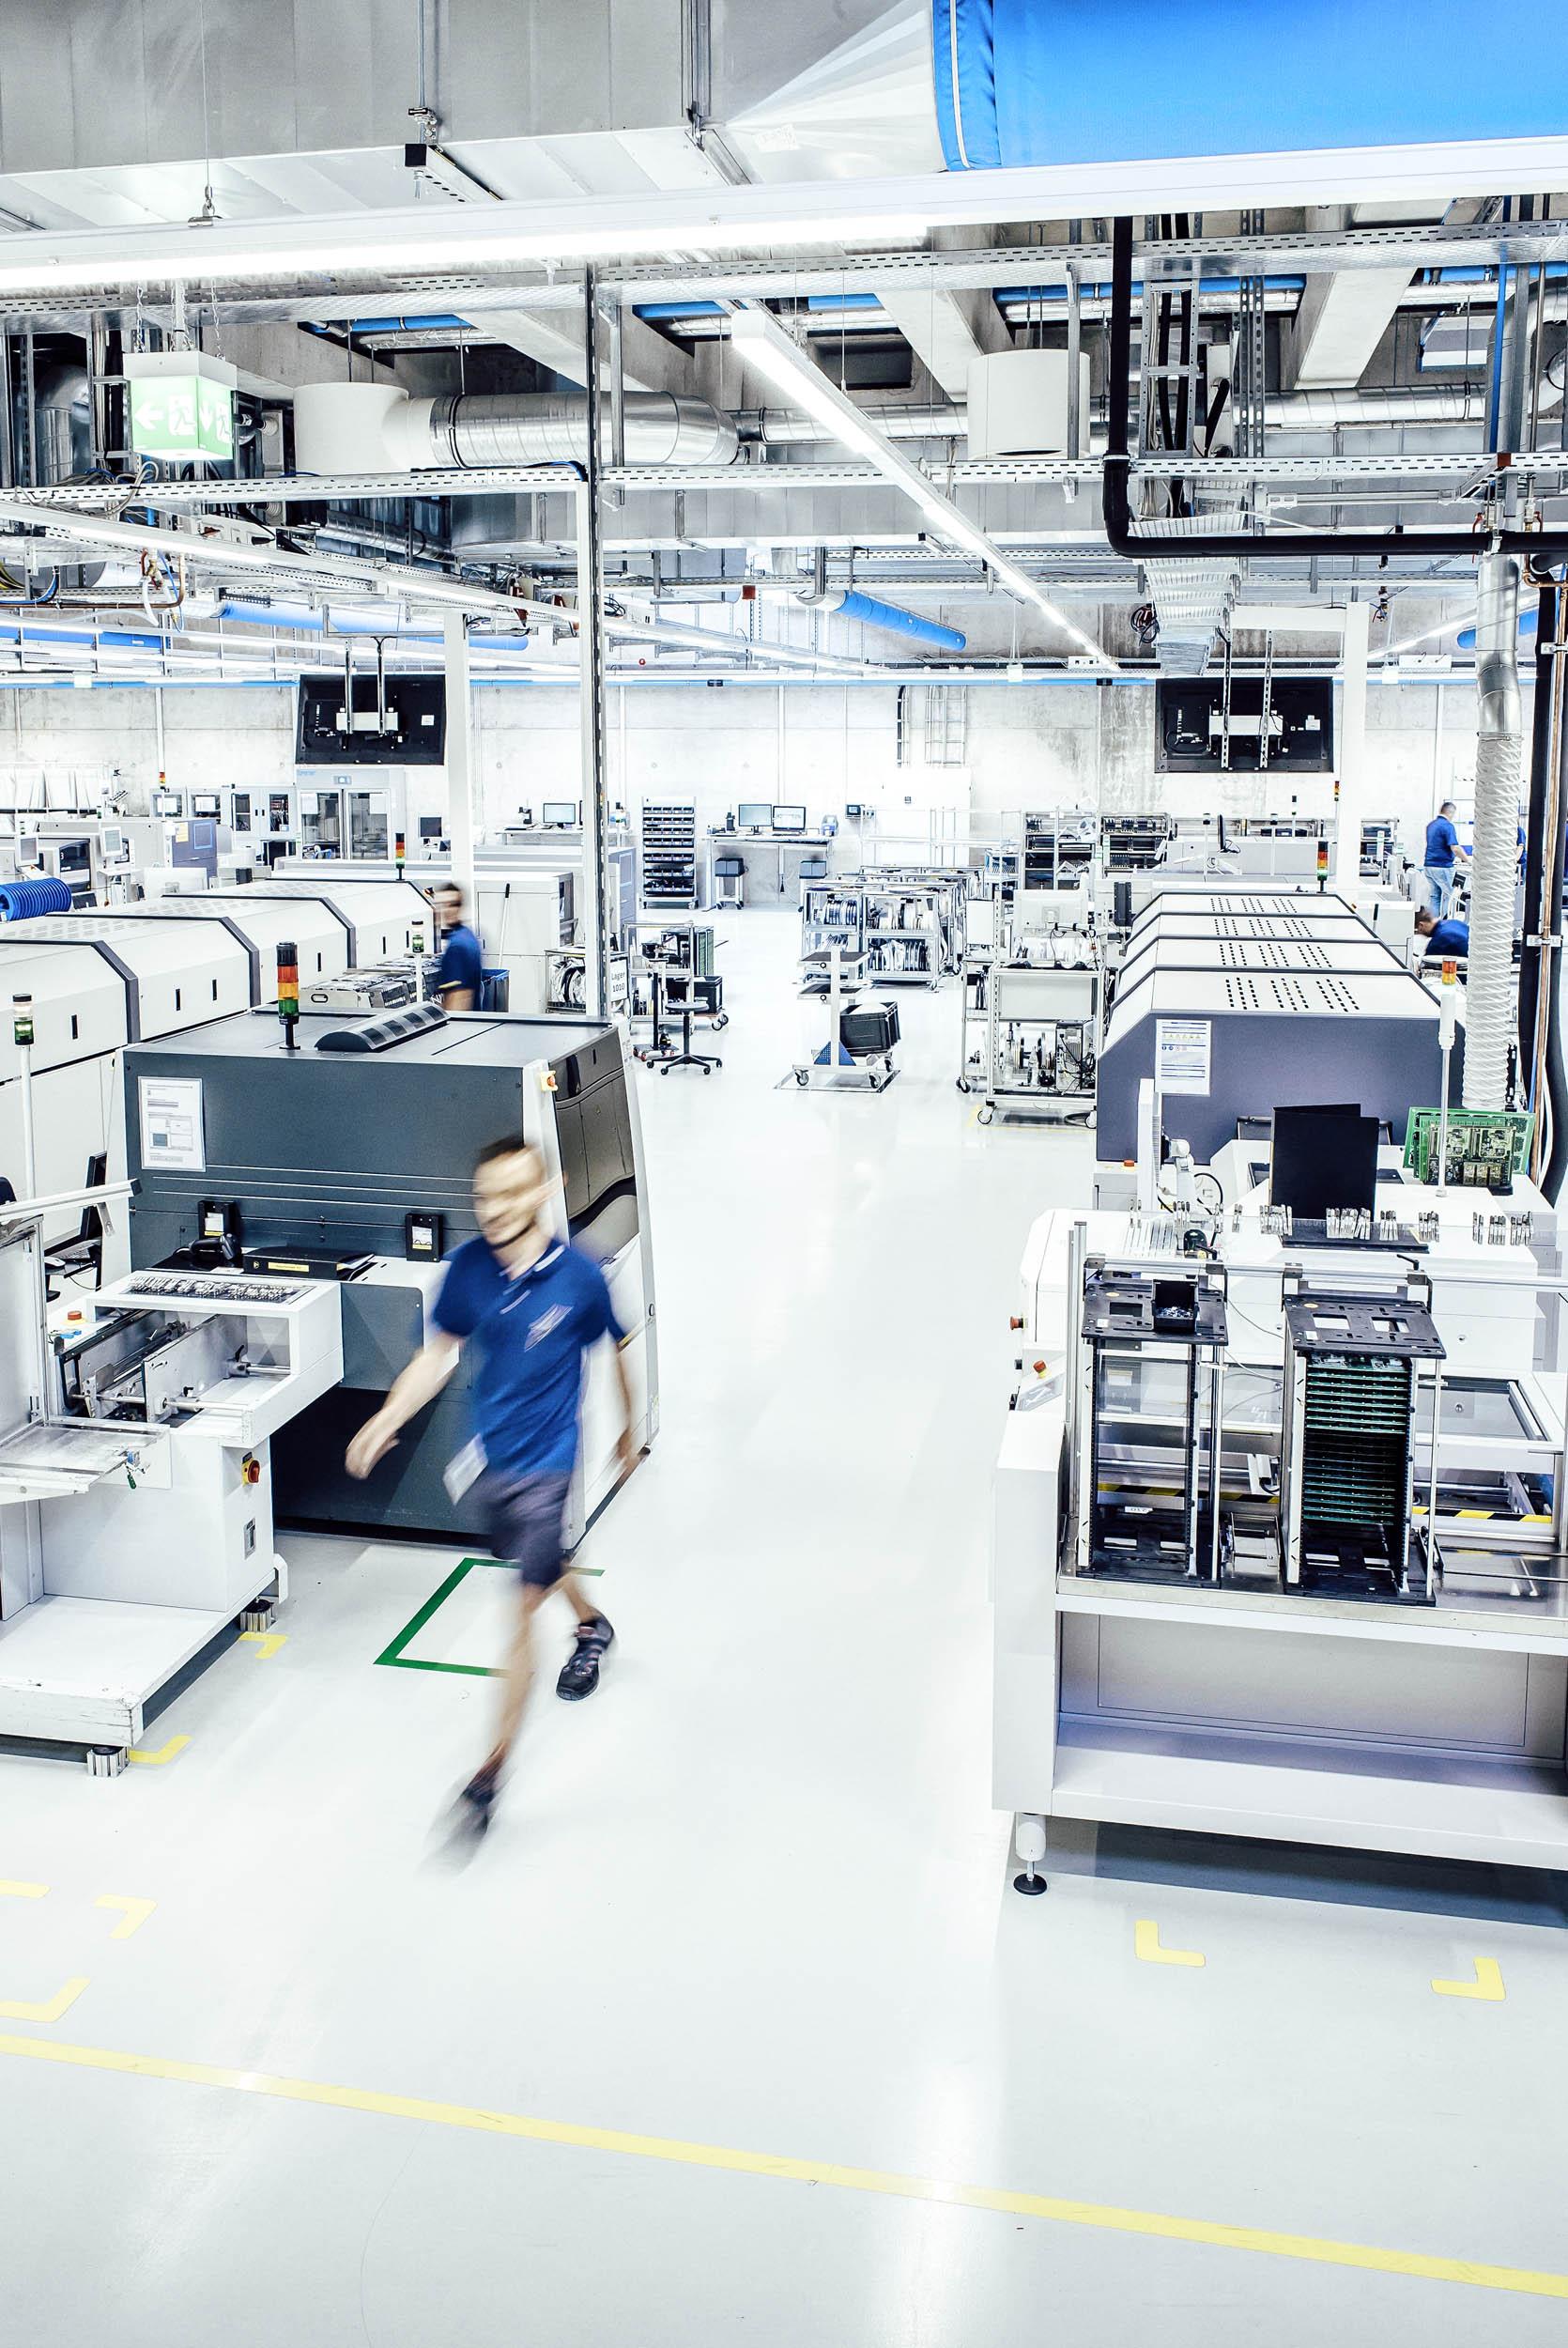 seifertuebler-corporate-hekatron-brandschutz-08.jpg